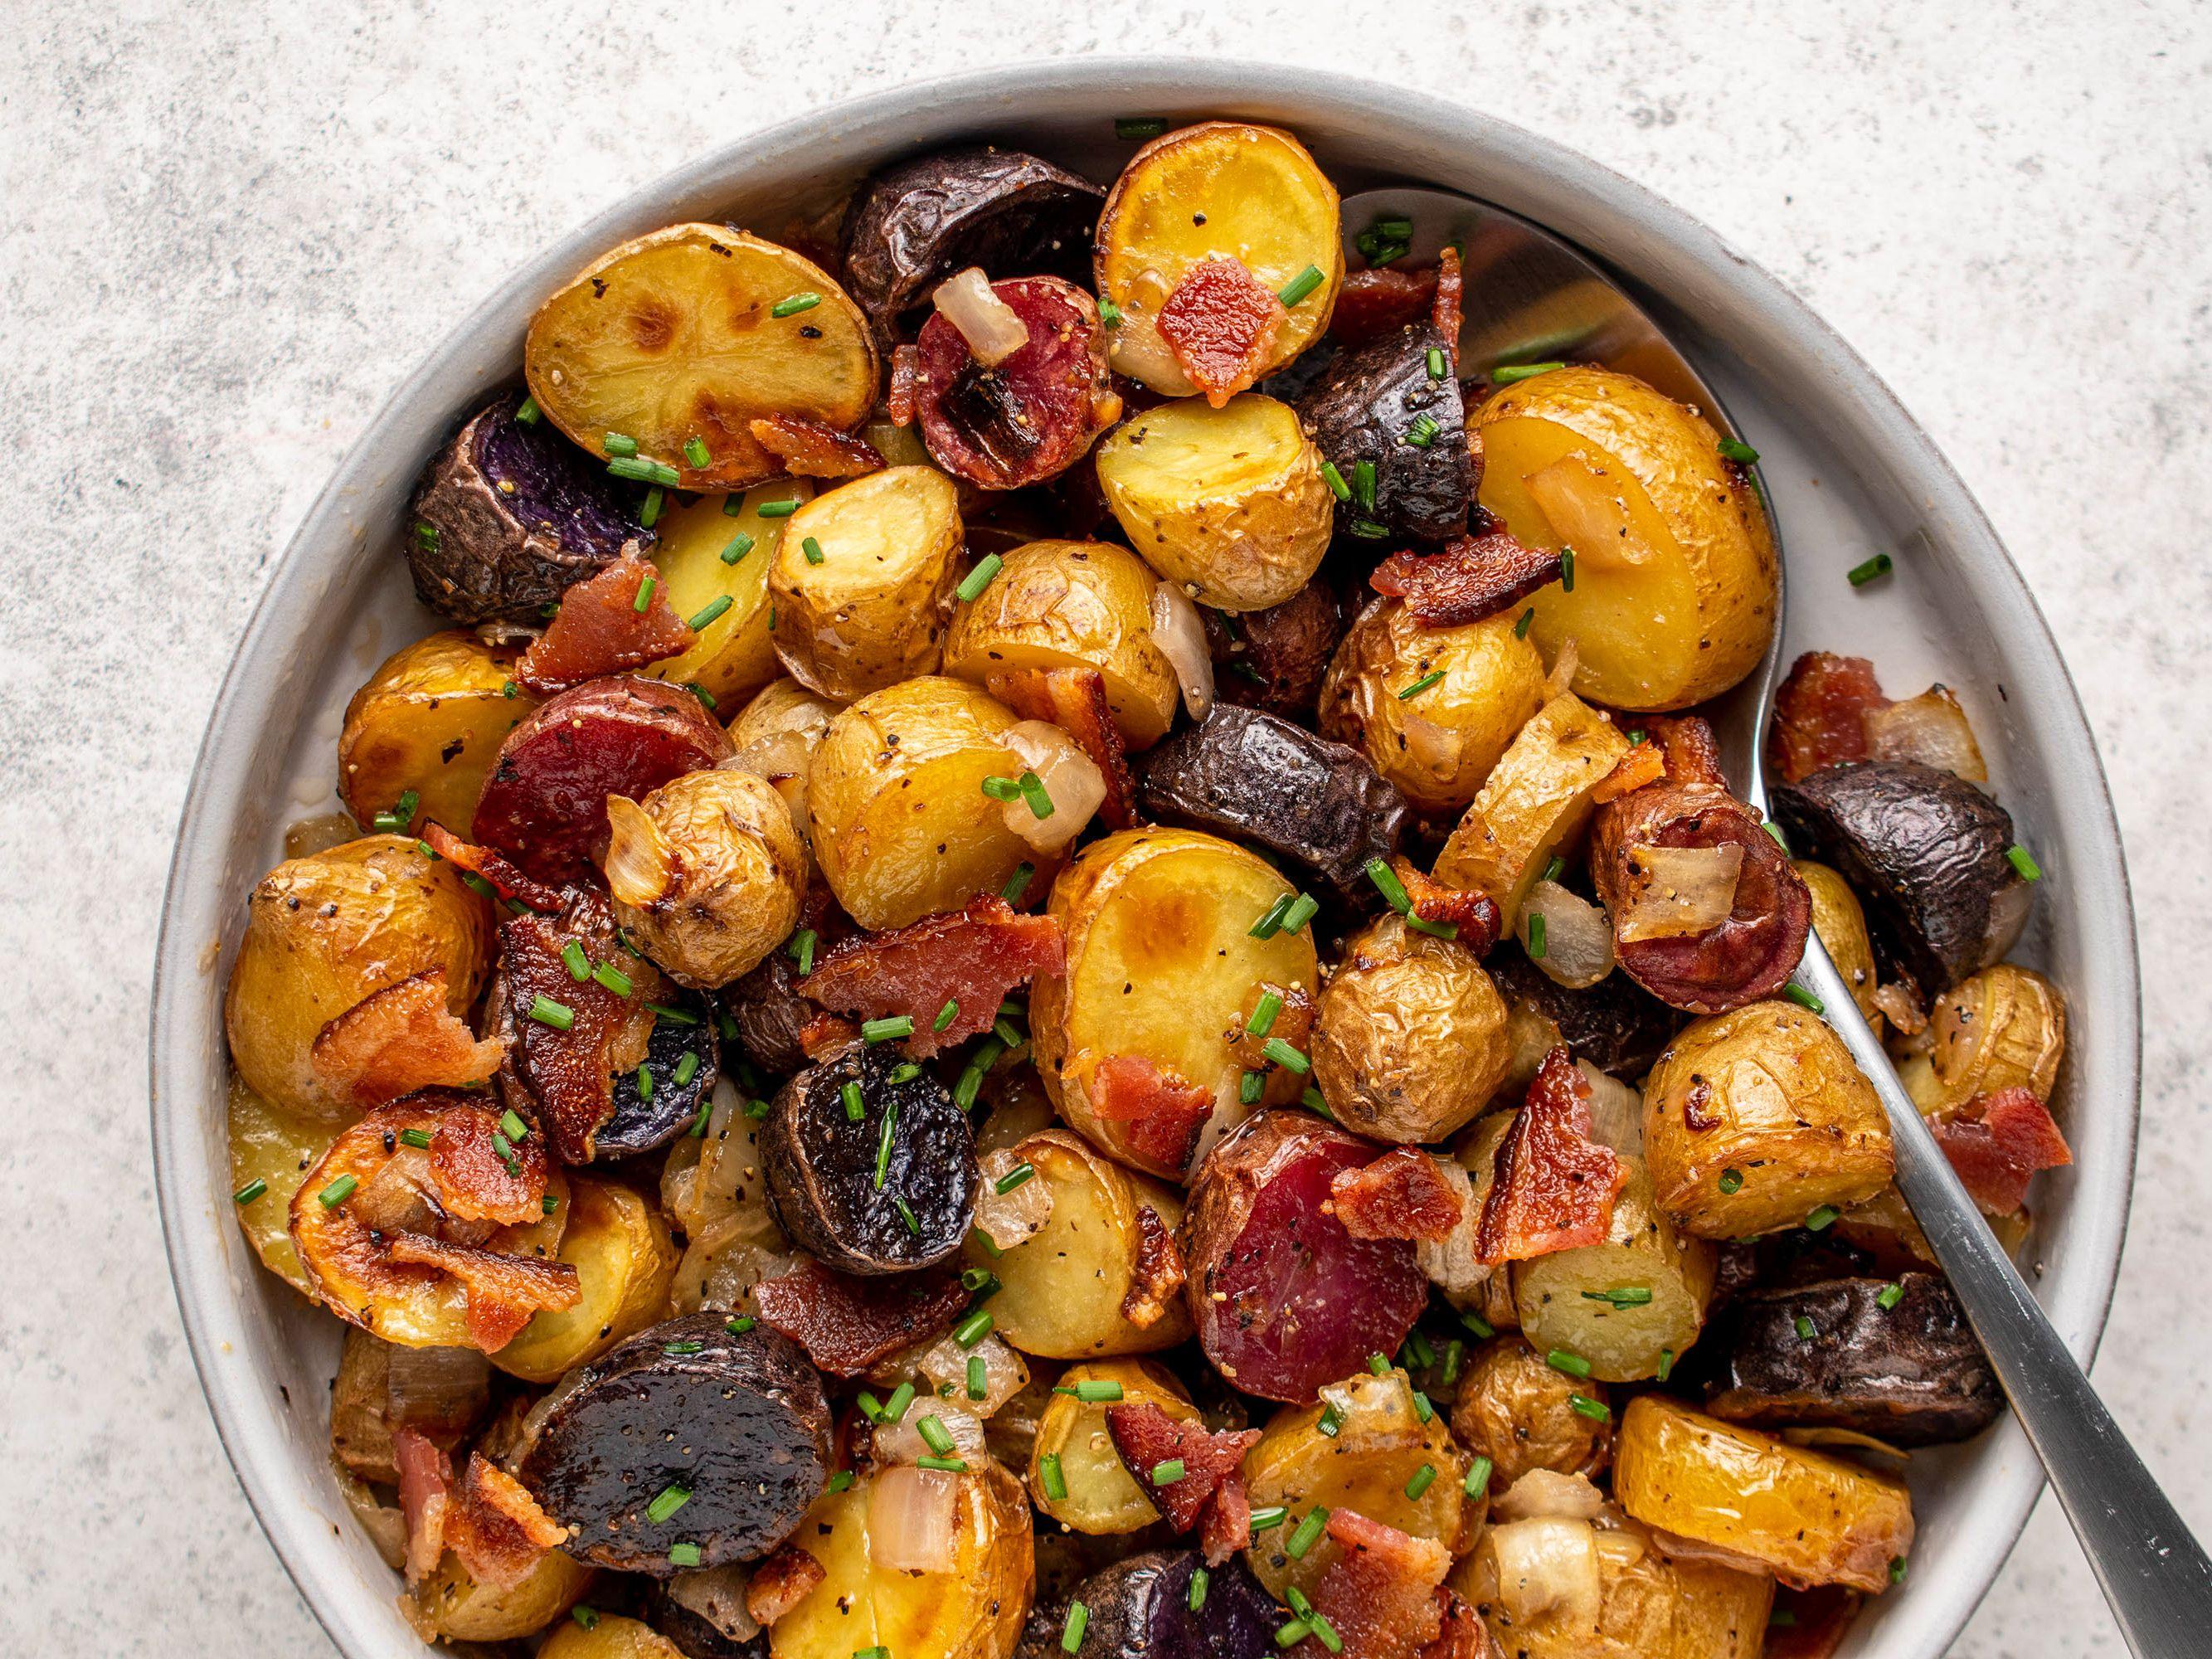 German Roasted Potato Salad Recipe